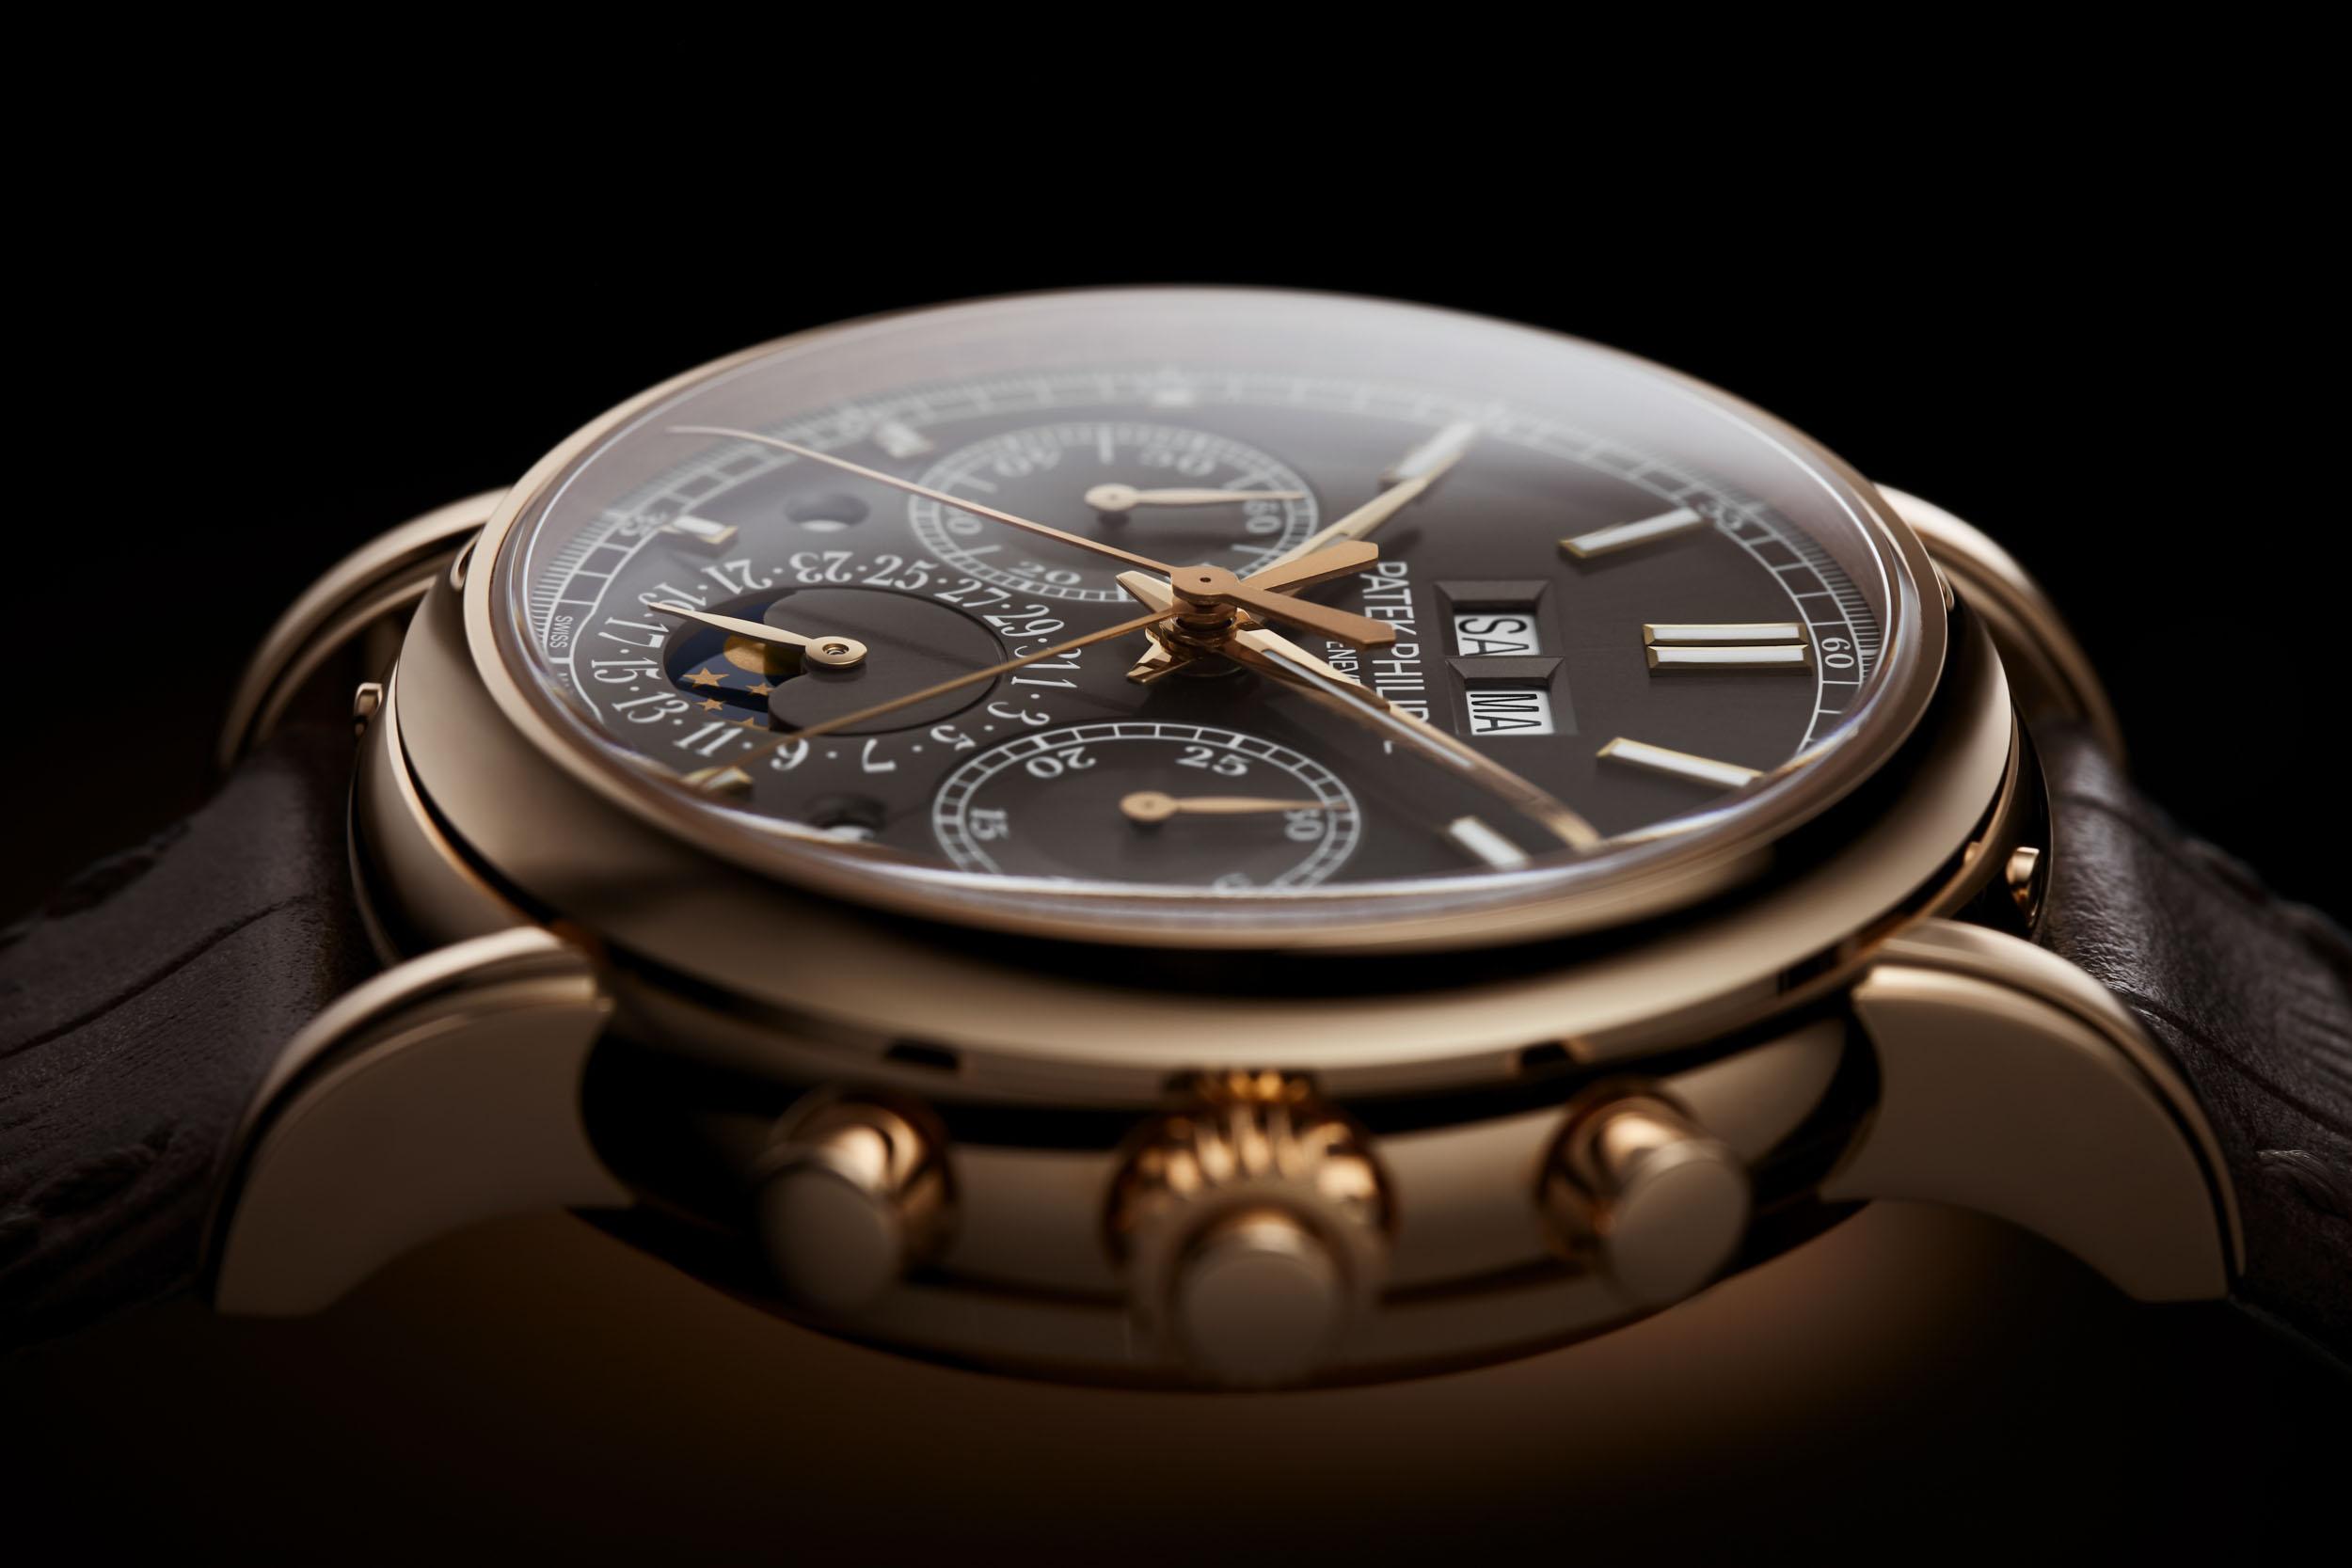 Patek Philippe 5204R-011 Split-Seconds Chronograph Perpetual Calendar